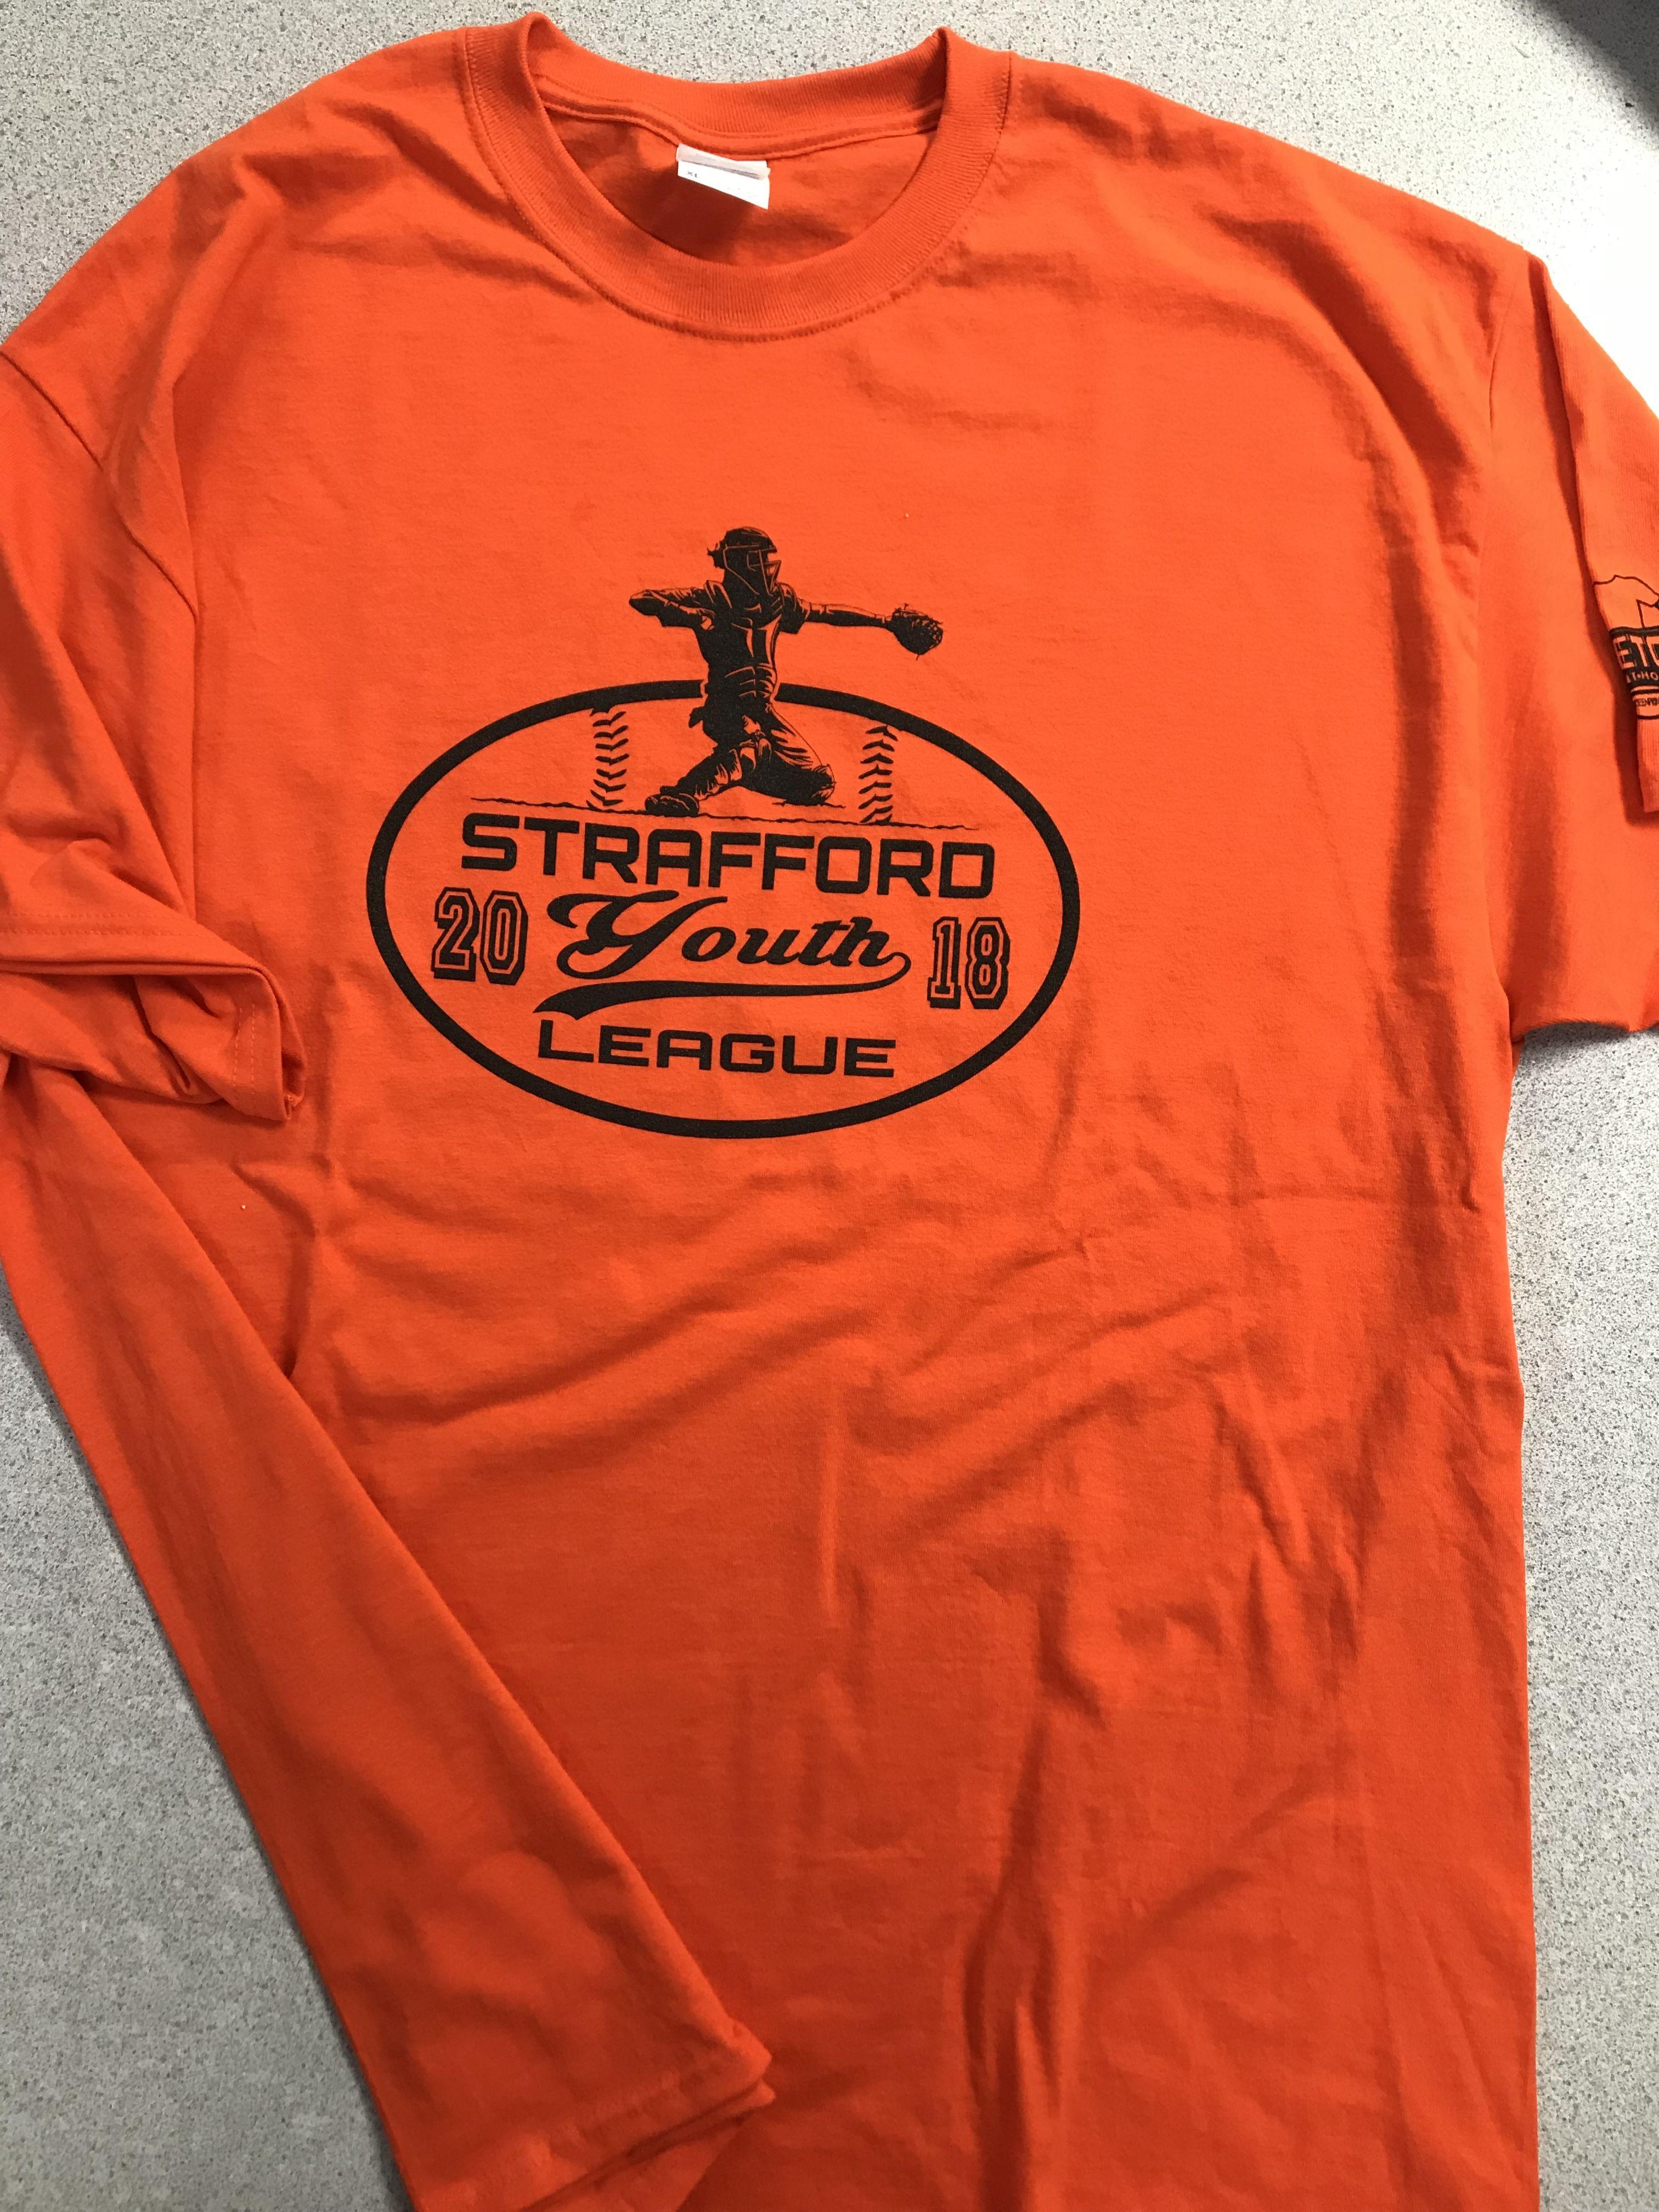 Strafford Youth Baseball Printed Shirts Long Sleeve Tshirt Men Shirt Designs